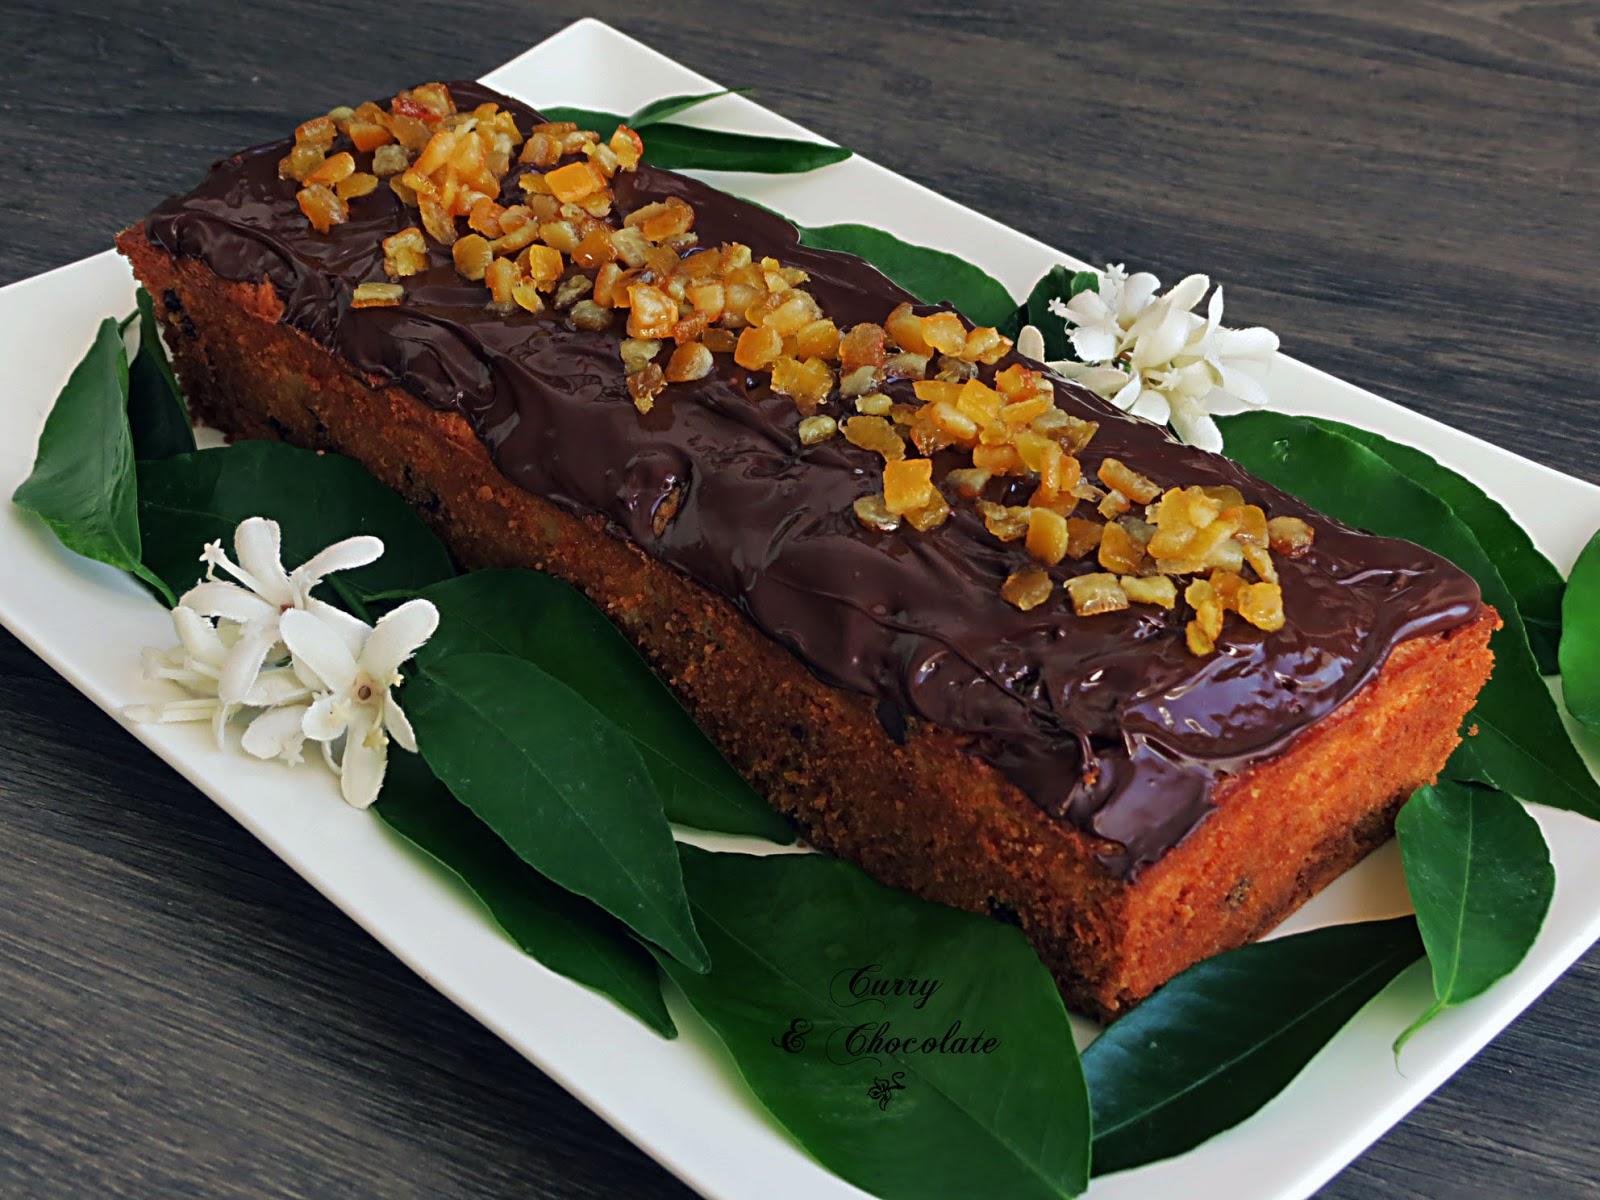 Bizcocho de ricotta con naranja confitada y chocolate - Ricotta cake with candied orange and chocolate